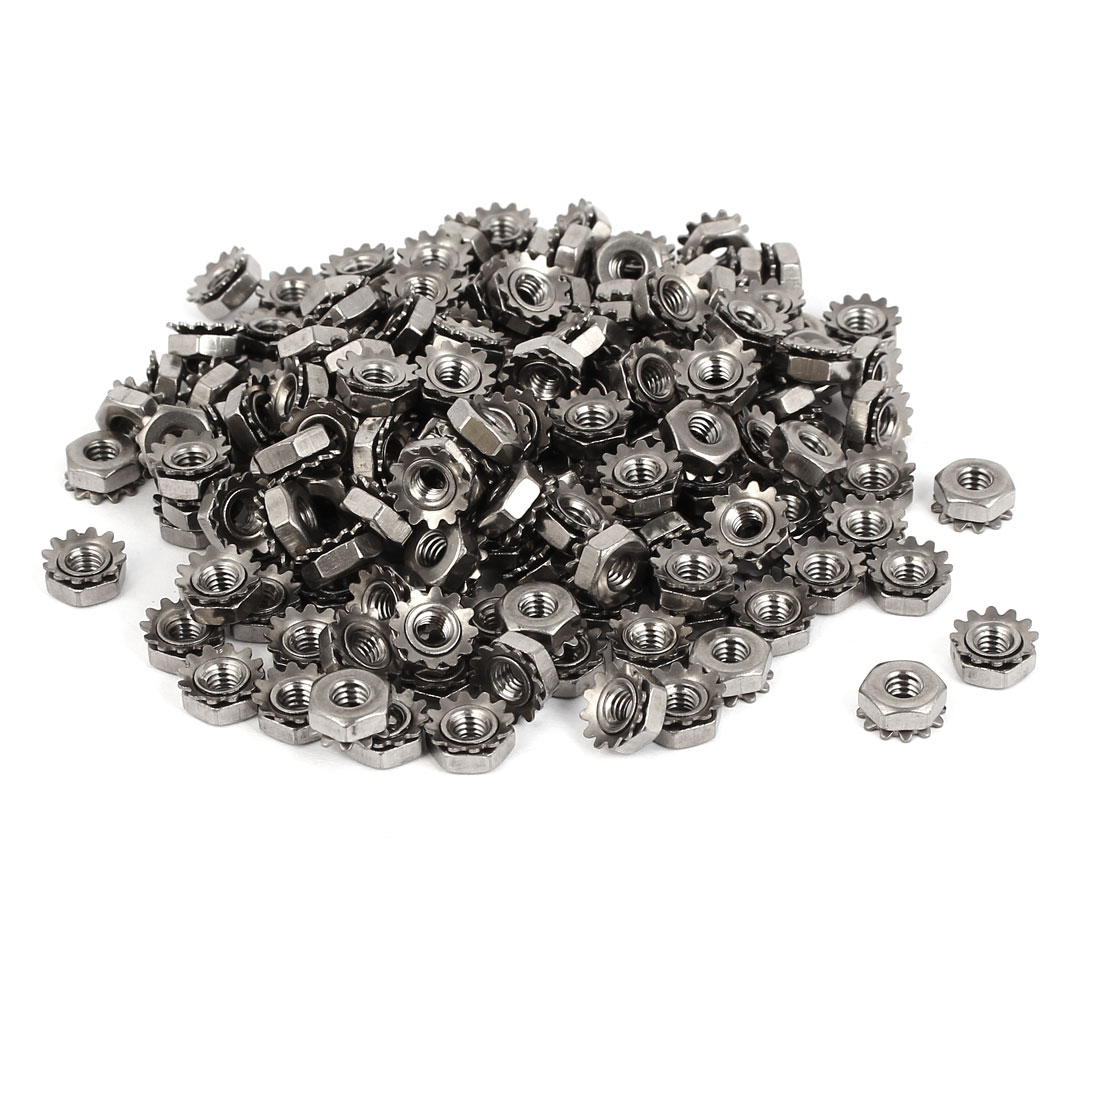 8#-32 304 Stainless Steel Female Thread Kep Hex Head Lock Nut 200pcs